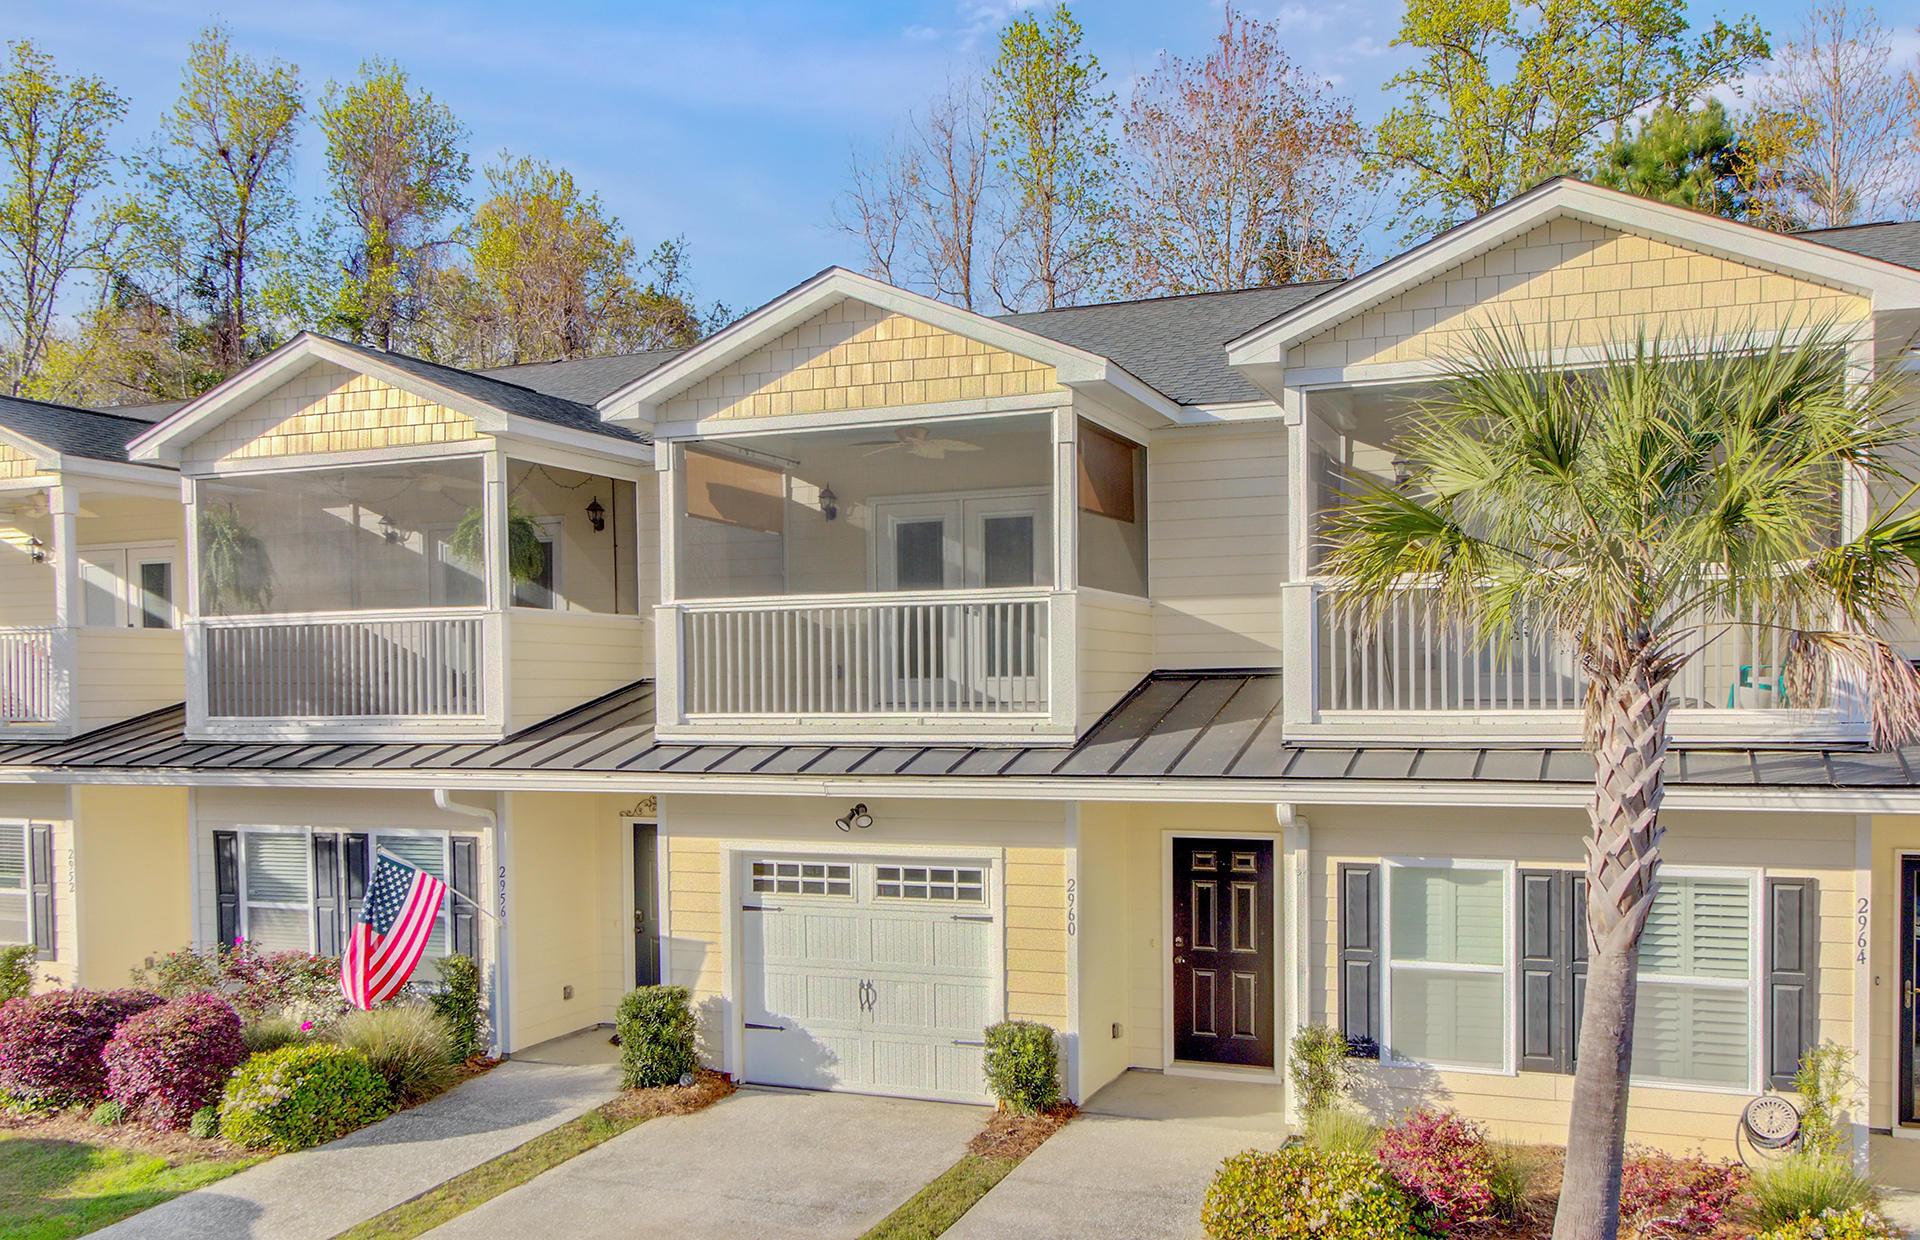 Carol Oaks Town Homes Homes For Sale - 2960 Emma, Mount Pleasant, SC - 25